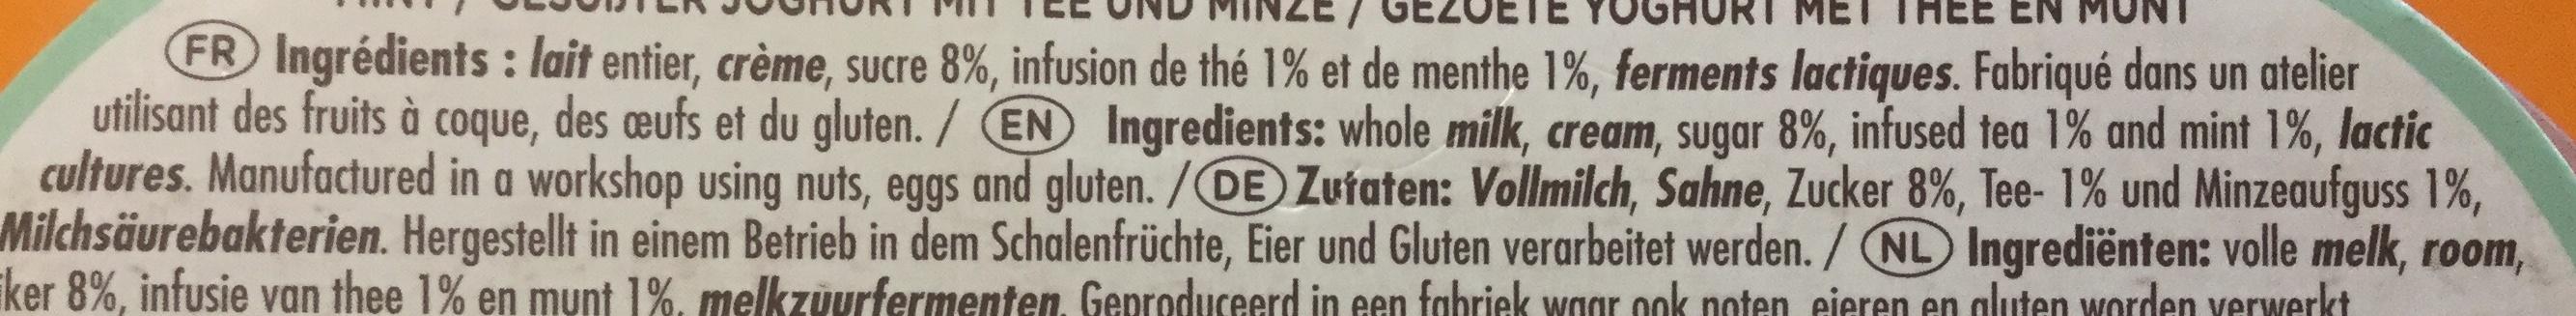 Thé menthe - Ingredients